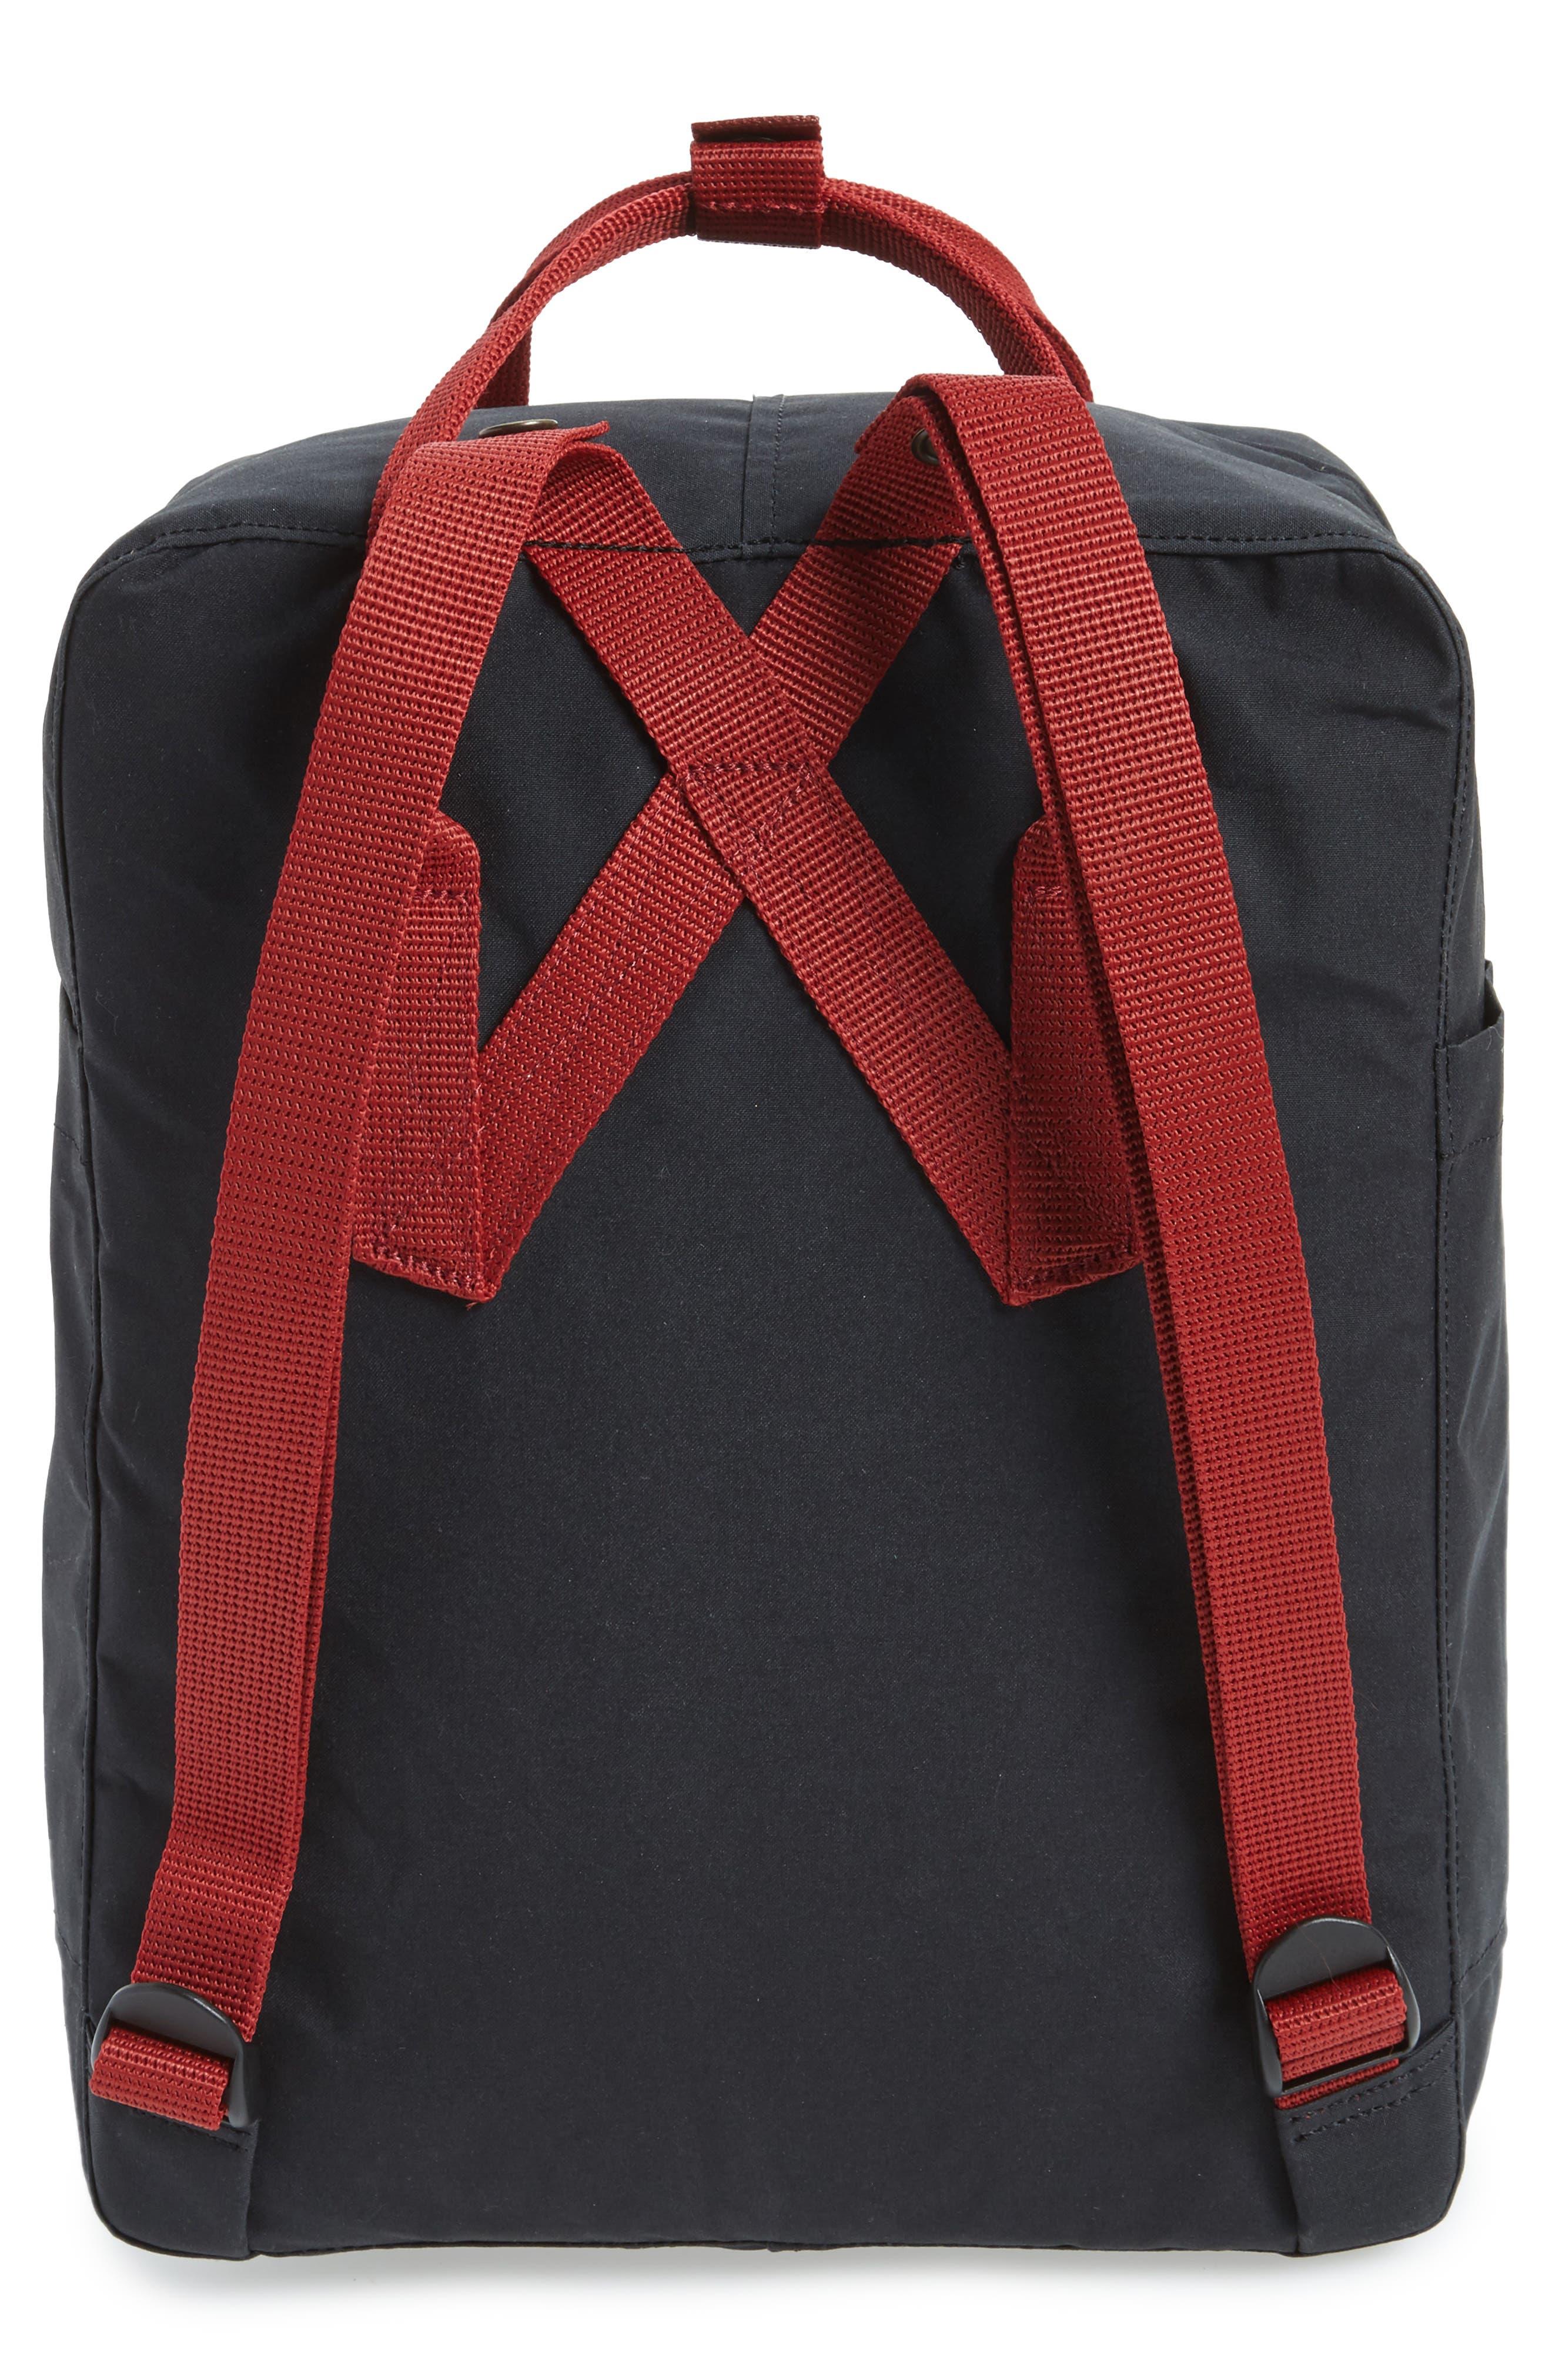 'Kånken' Water Resistant Backpack,                             Alternate thumbnail 160, color,